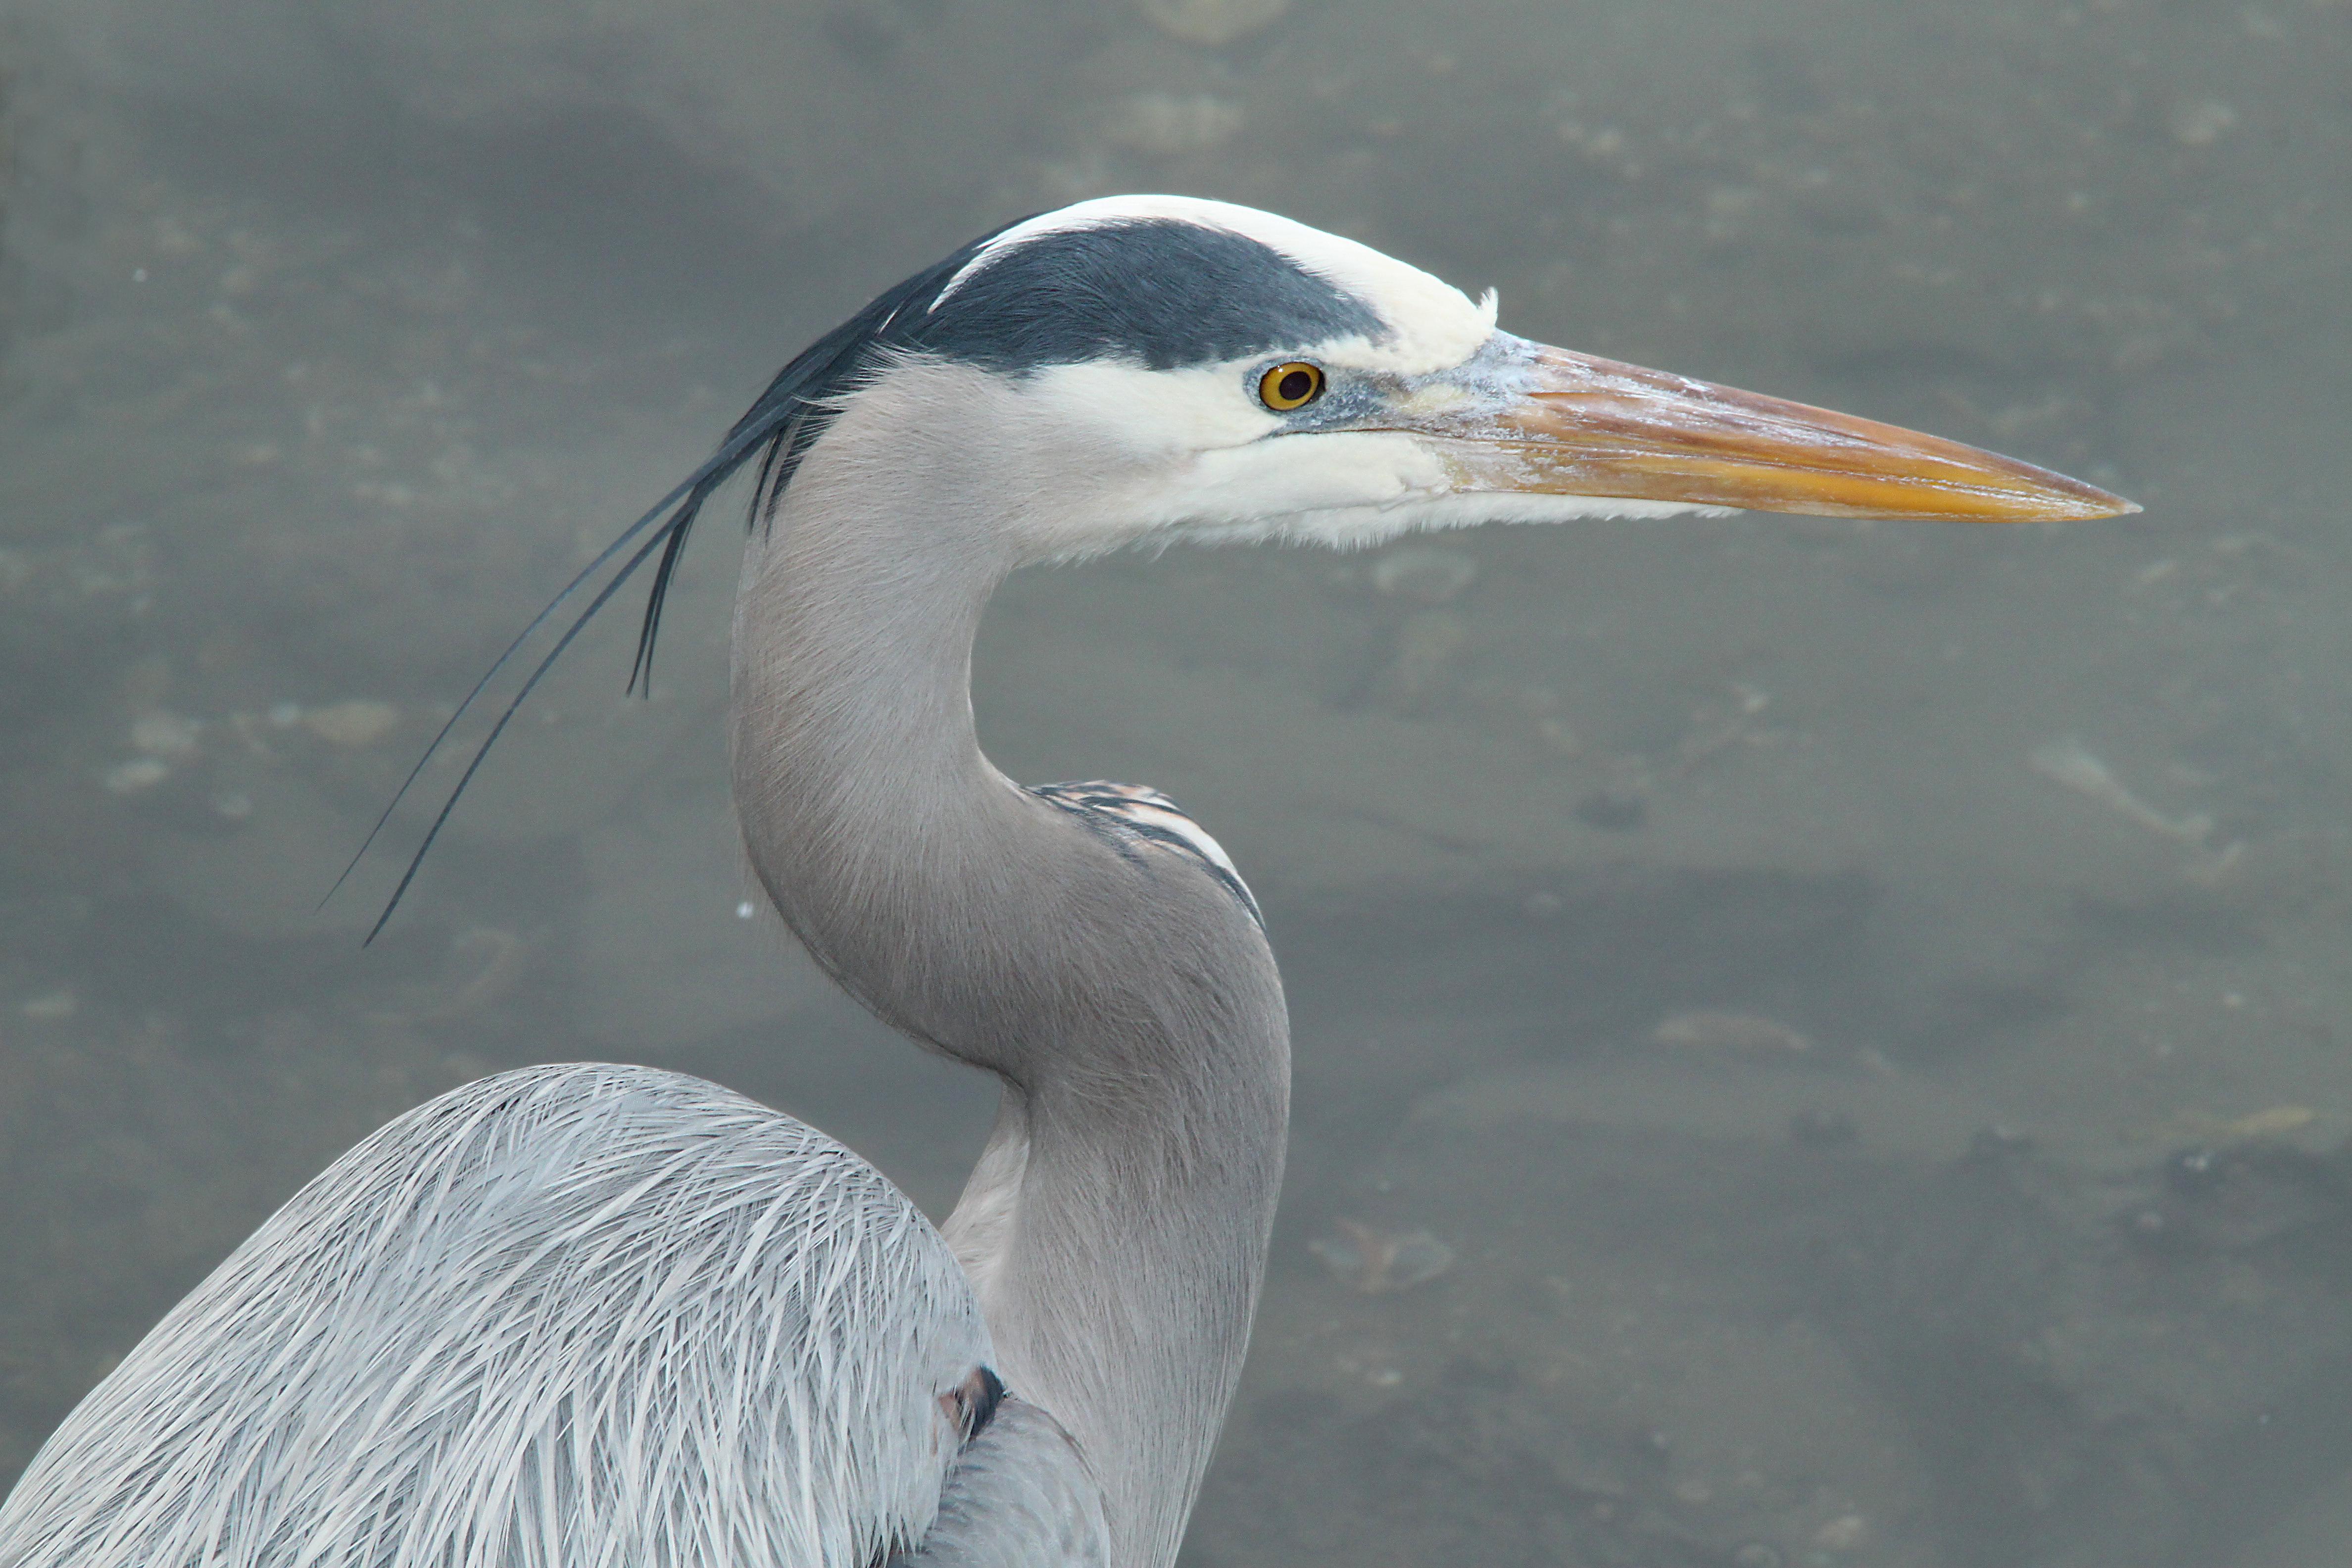 Heron, great blue (1-9-10) morro bay, ca -01 photo